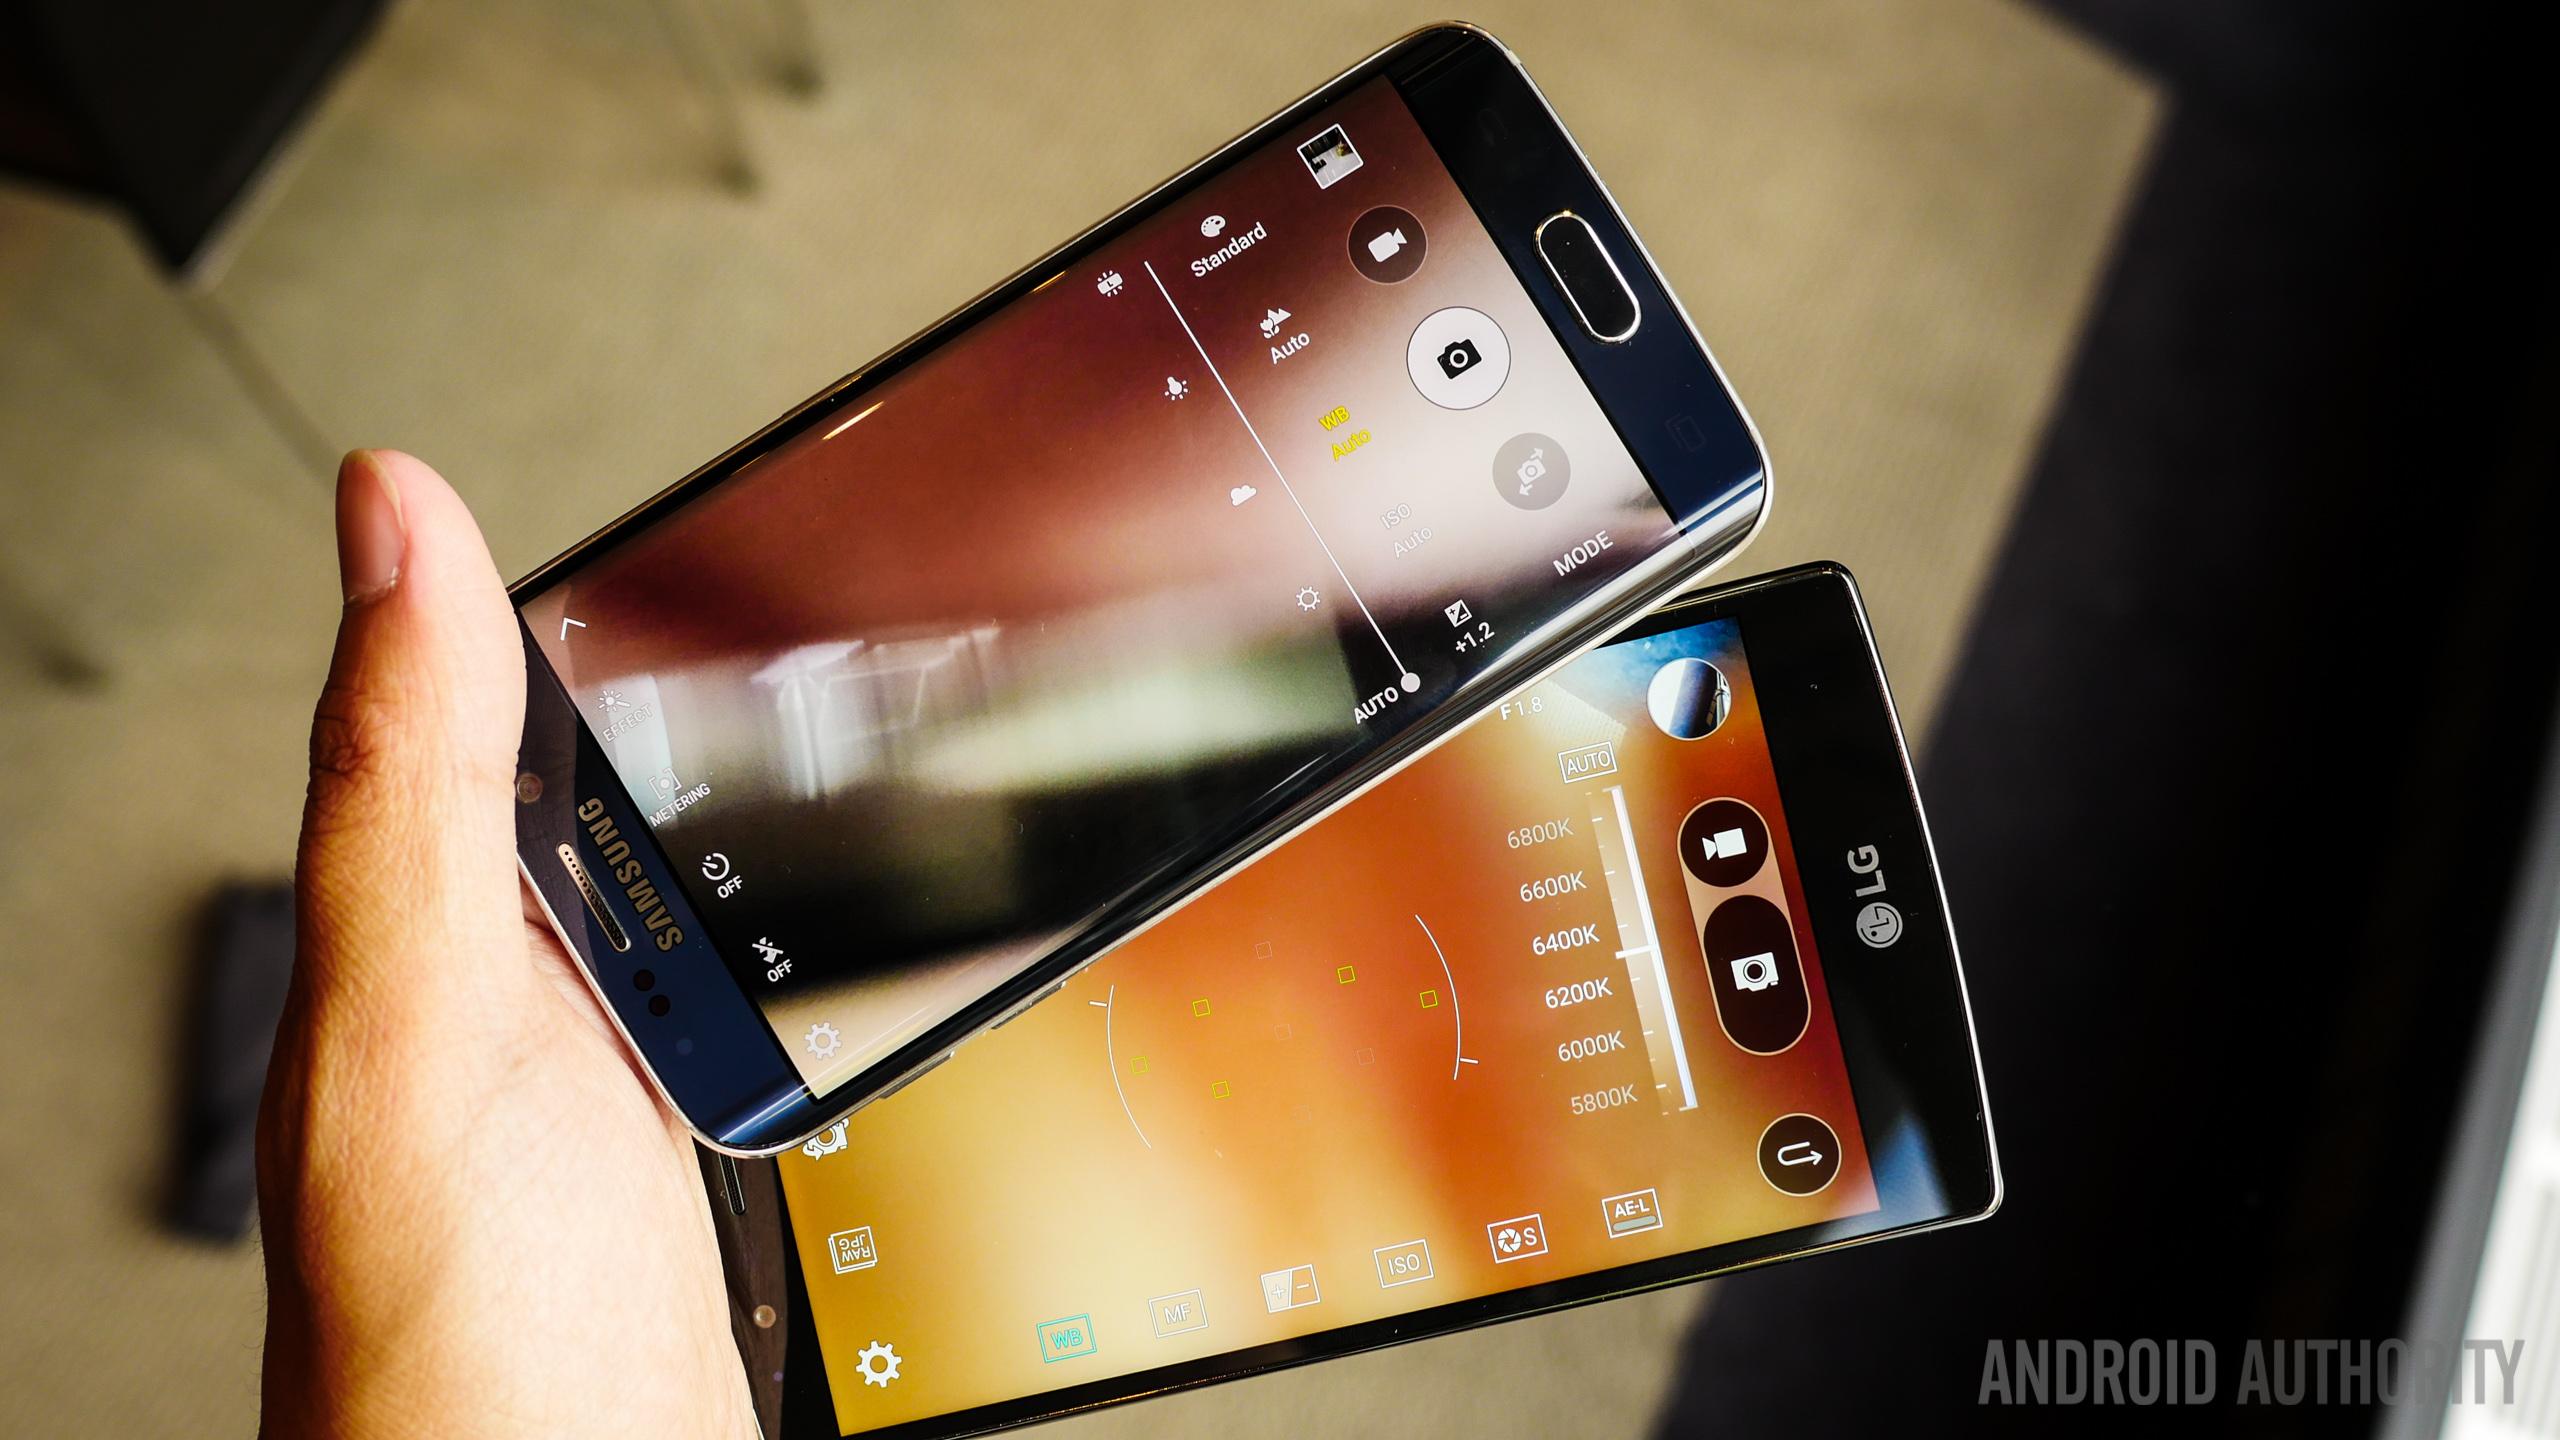 Lg G4 Vs Galaxy S7 Edge: LG G4 Vs Samsung Galaxy S6 Edge Quick Look